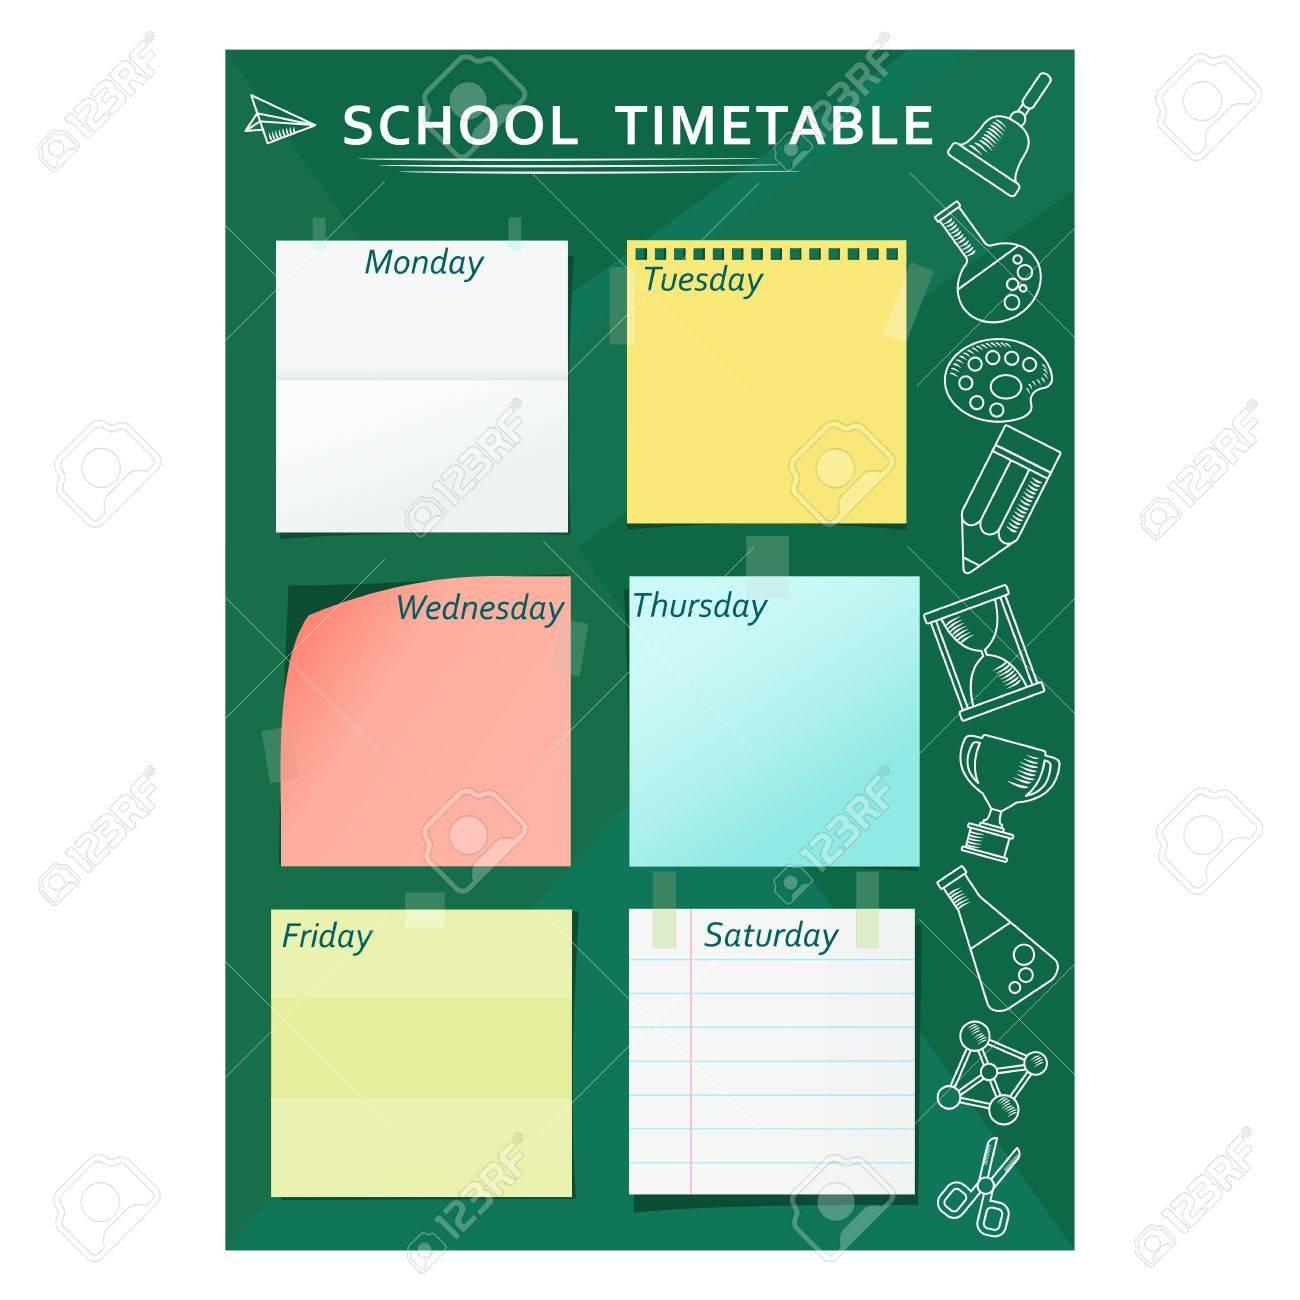 Week Timetable Ukrandiffusion